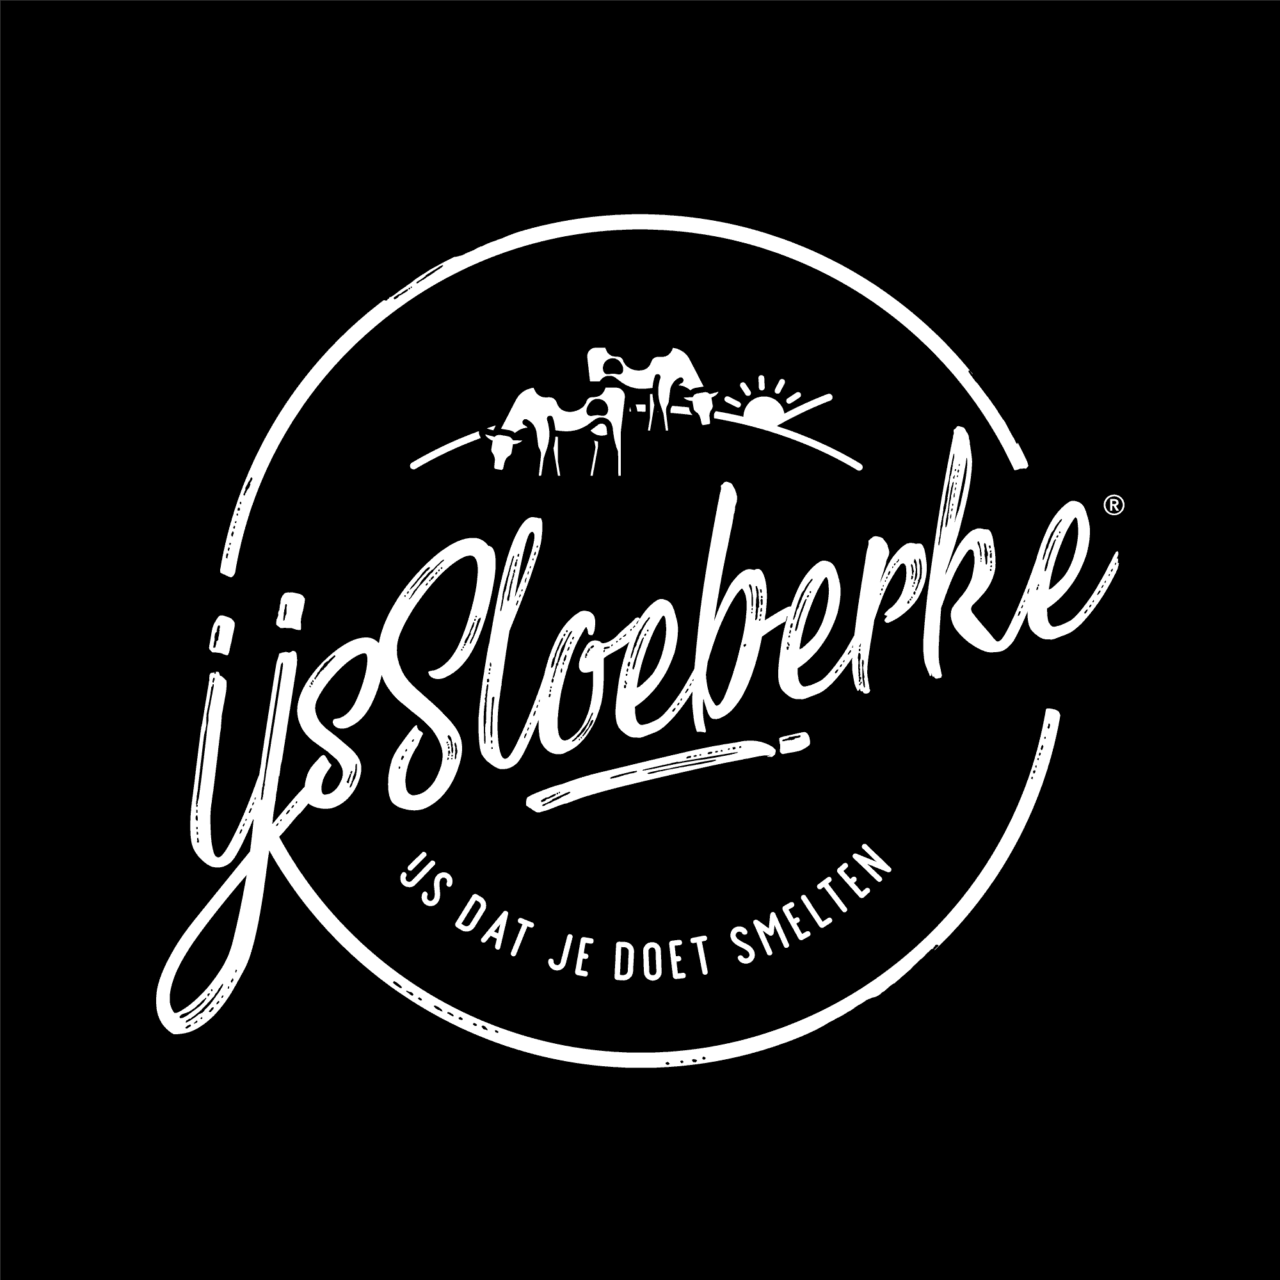 IJssloeberke-Logo-Zw-W-Negatief